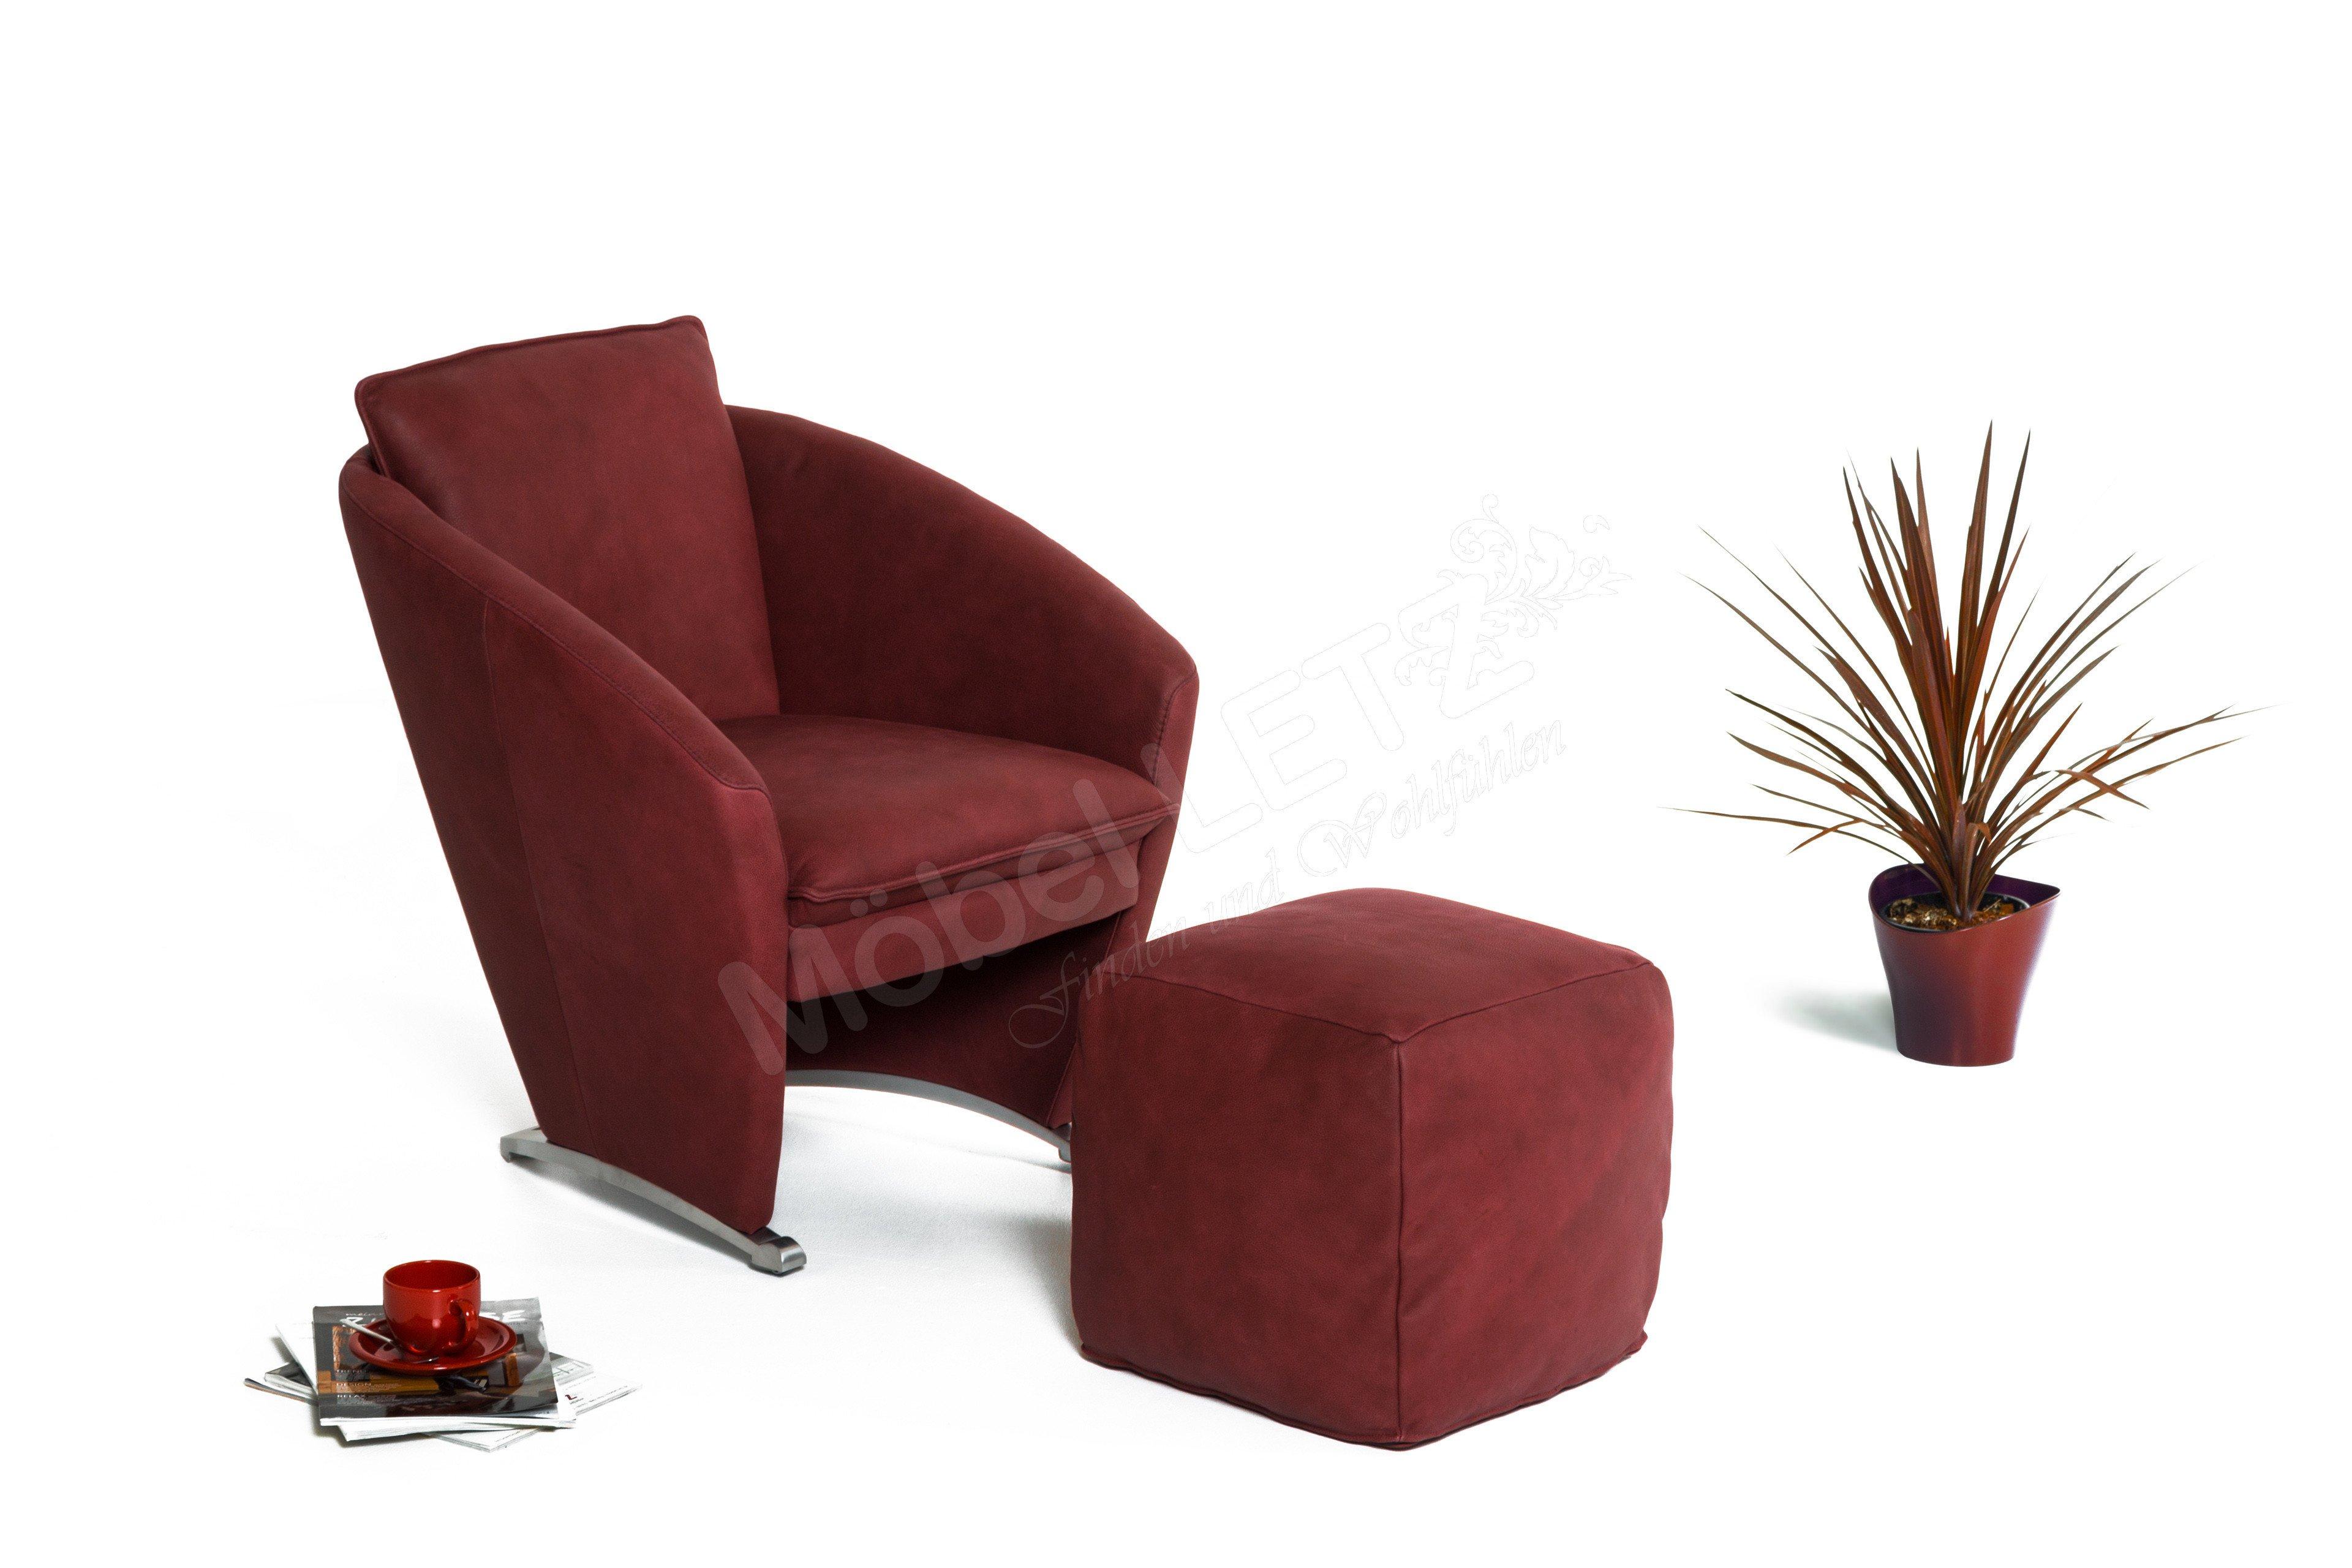 k w polsterm bel 7356 einzelsessel in weinrot m bel letz ihr online shop. Black Bedroom Furniture Sets. Home Design Ideas